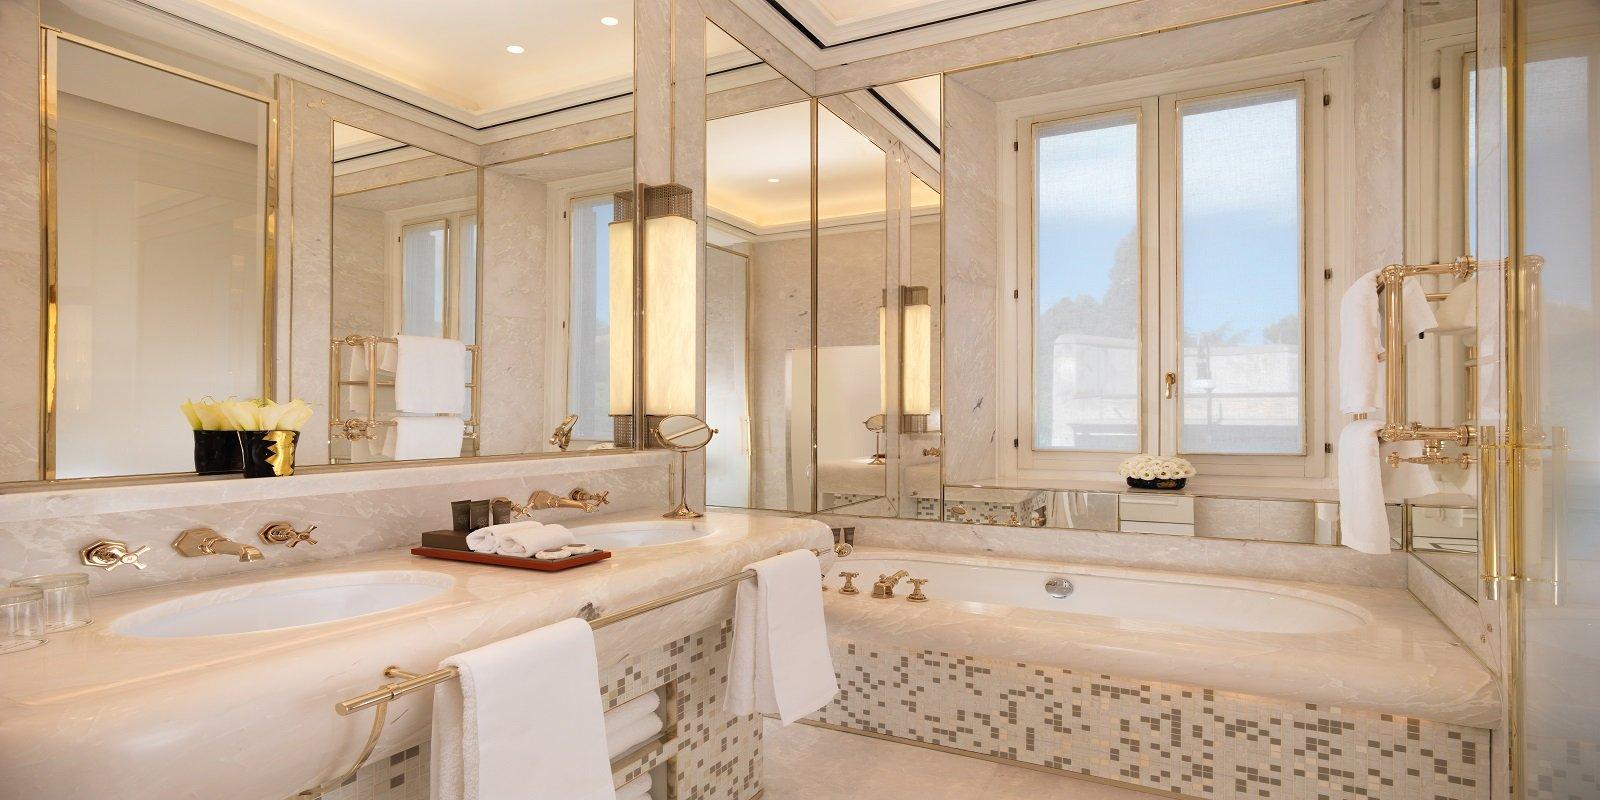 Sleek marble bathrooms